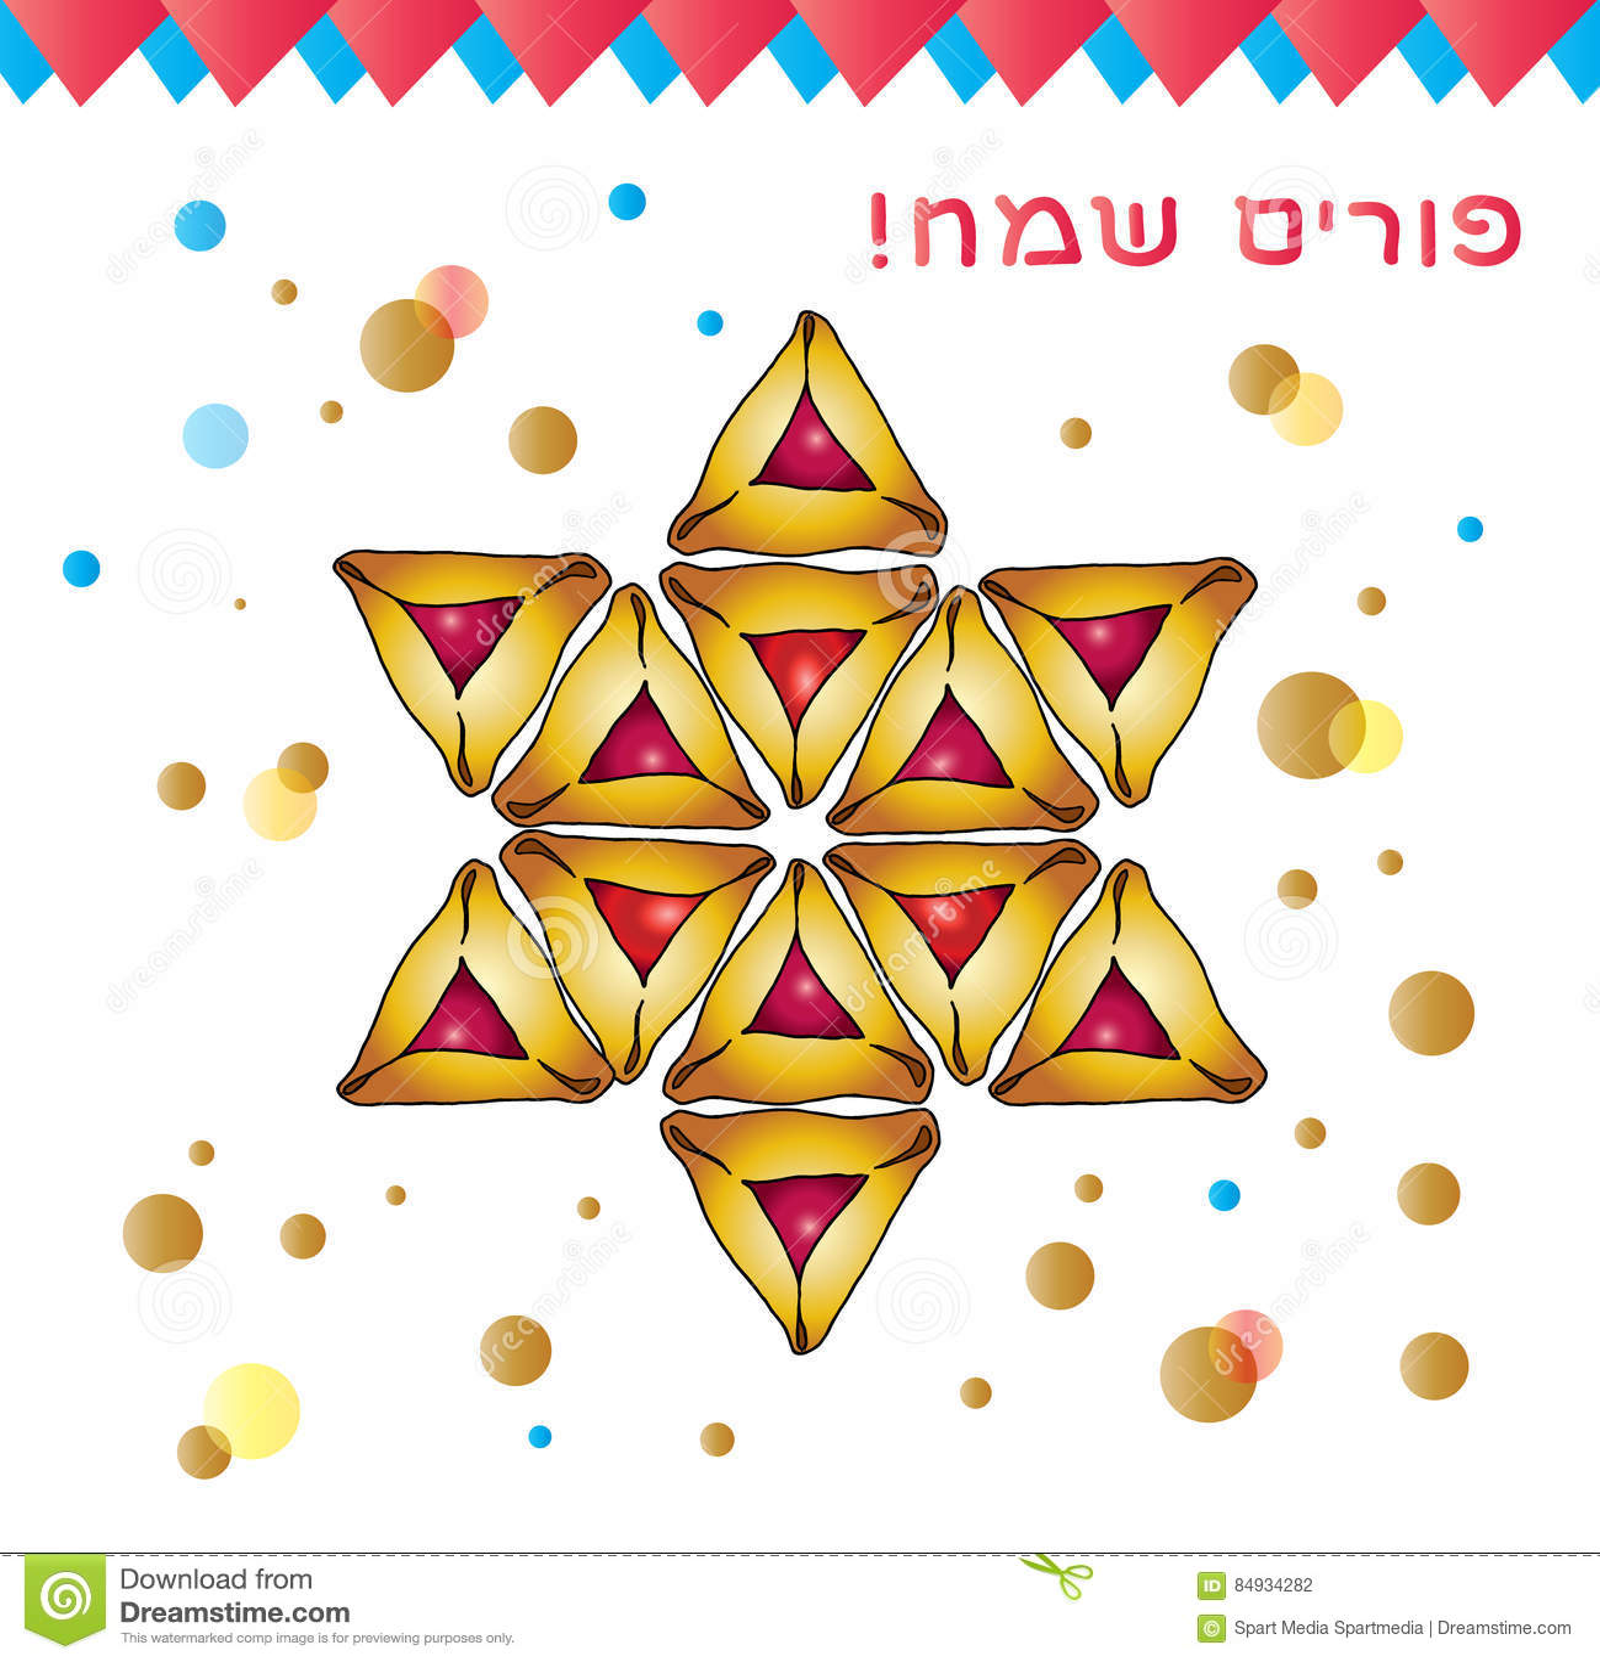 Purim greeting card hamantaschen cookies stock vector illustration purim greeting card hamantaschen cookies m4hsunfo